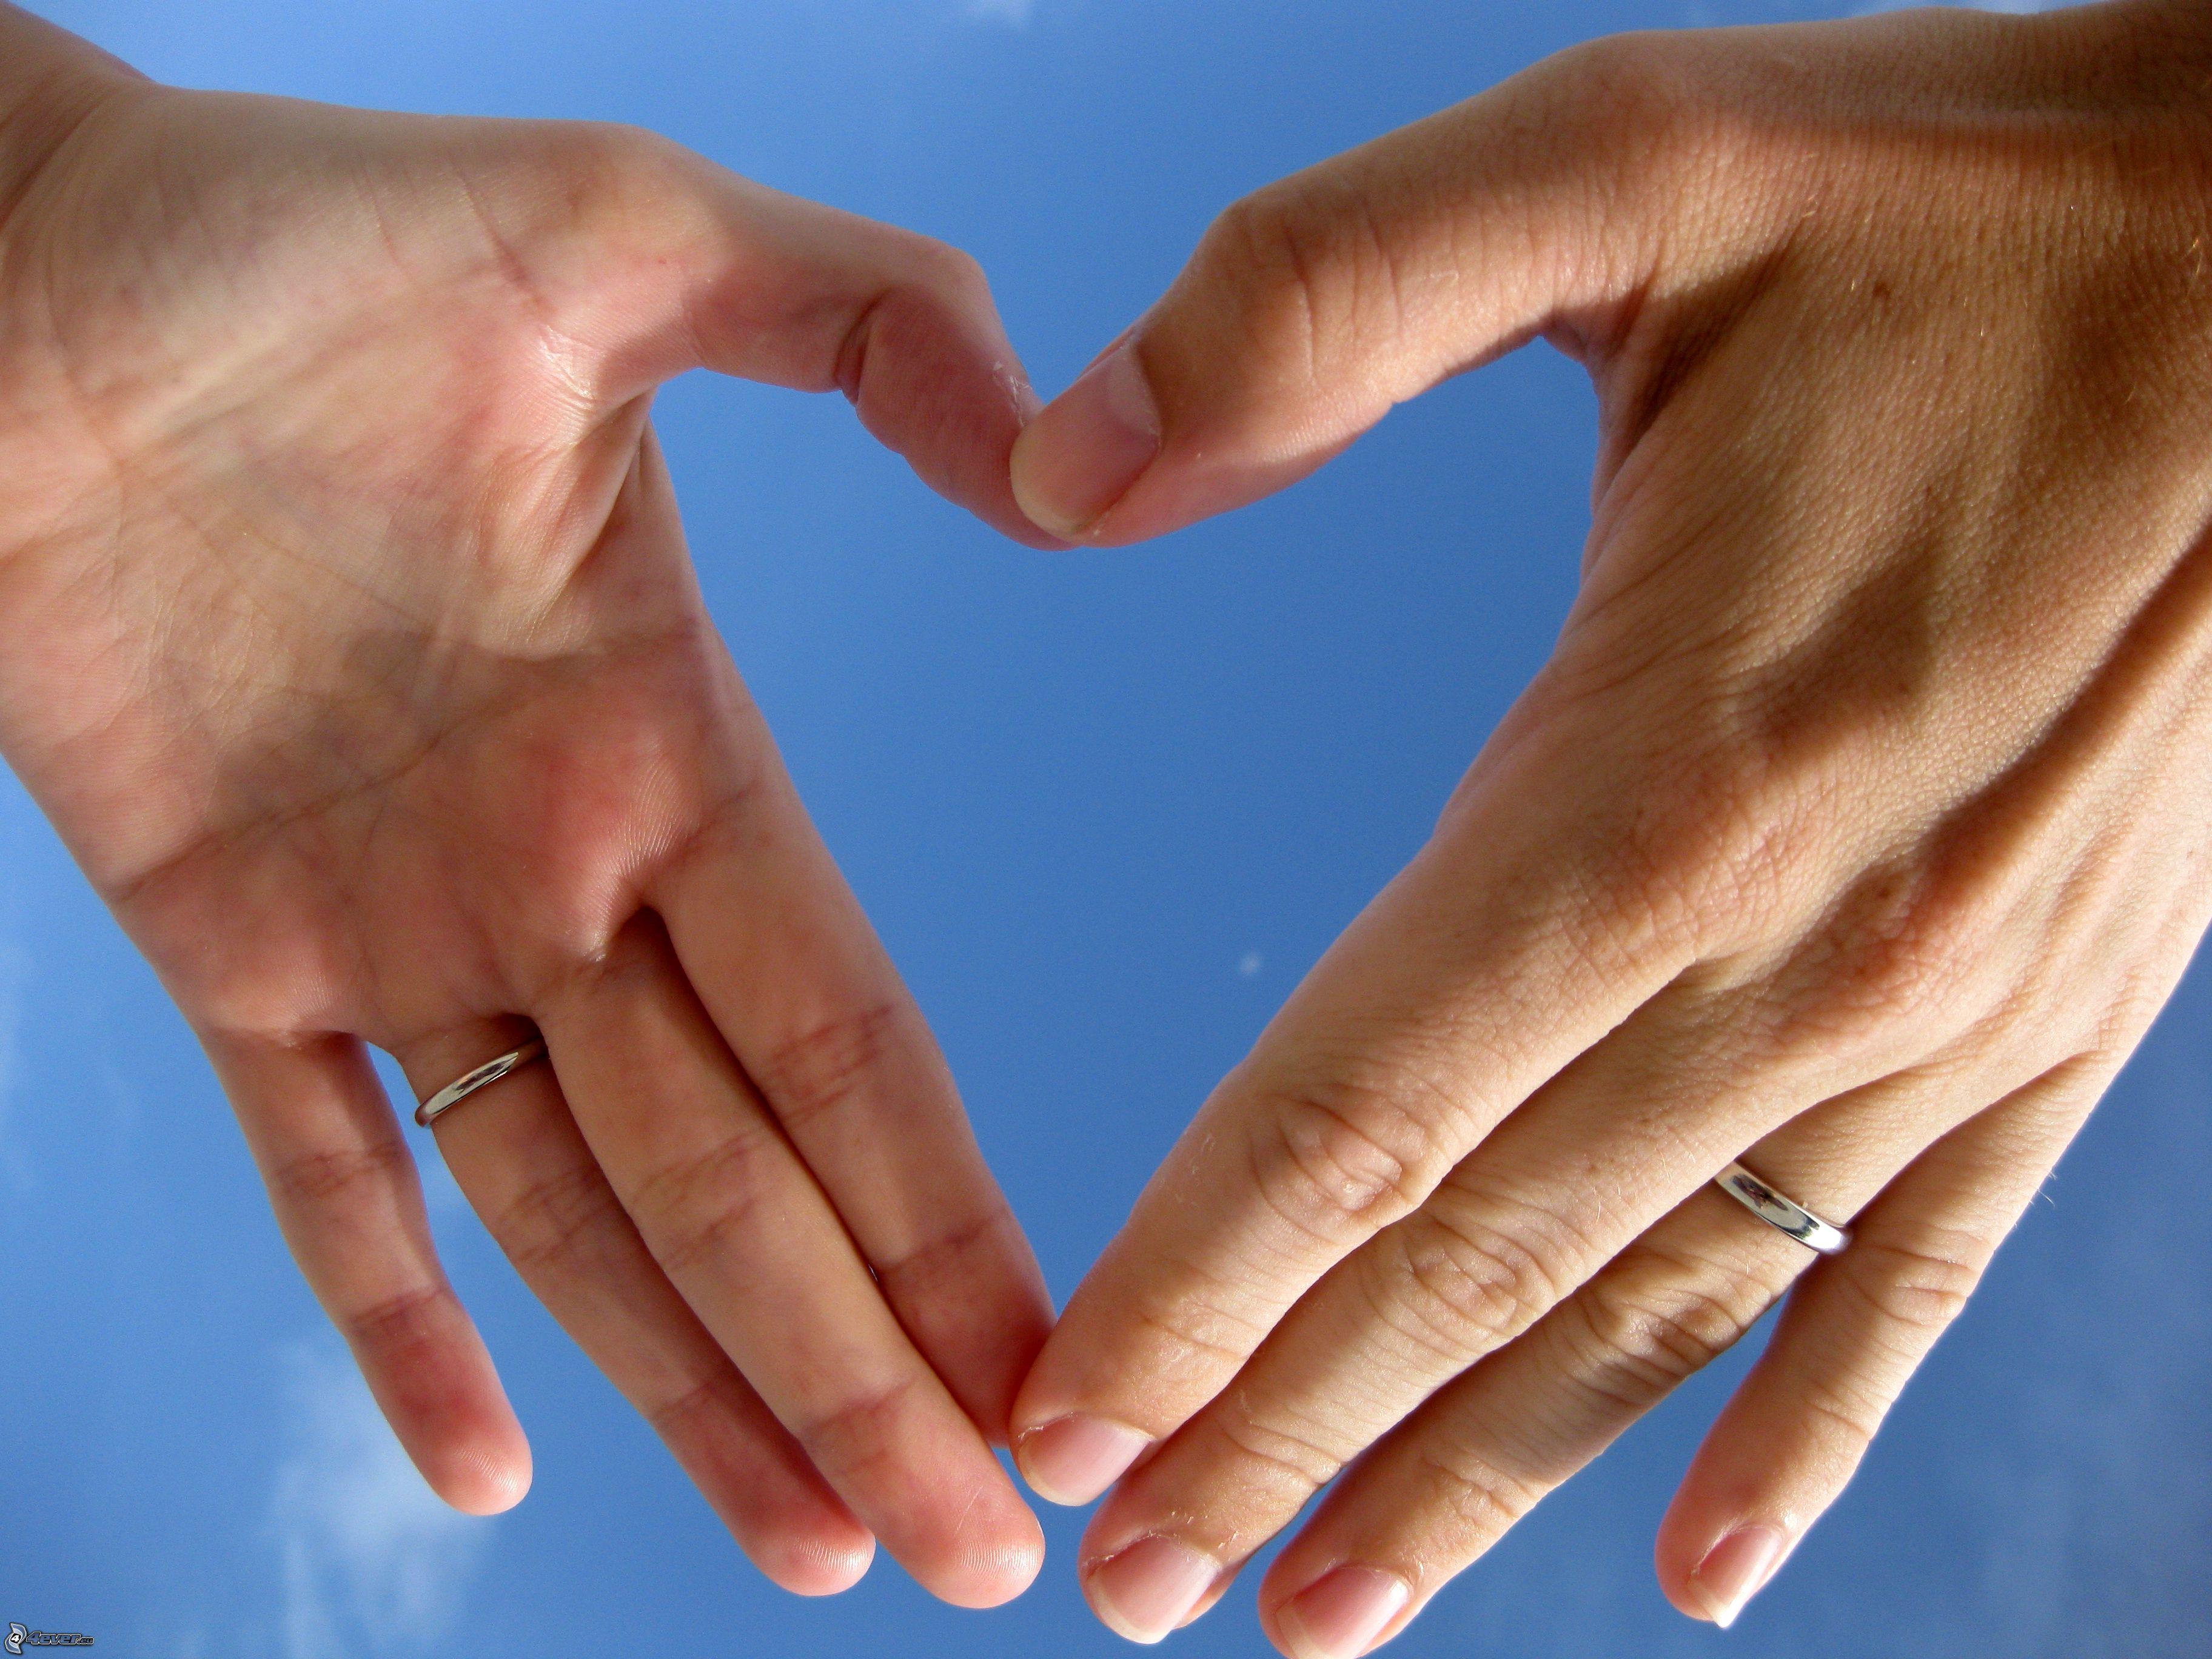 ruky v tvare srdca, obrucky 153357